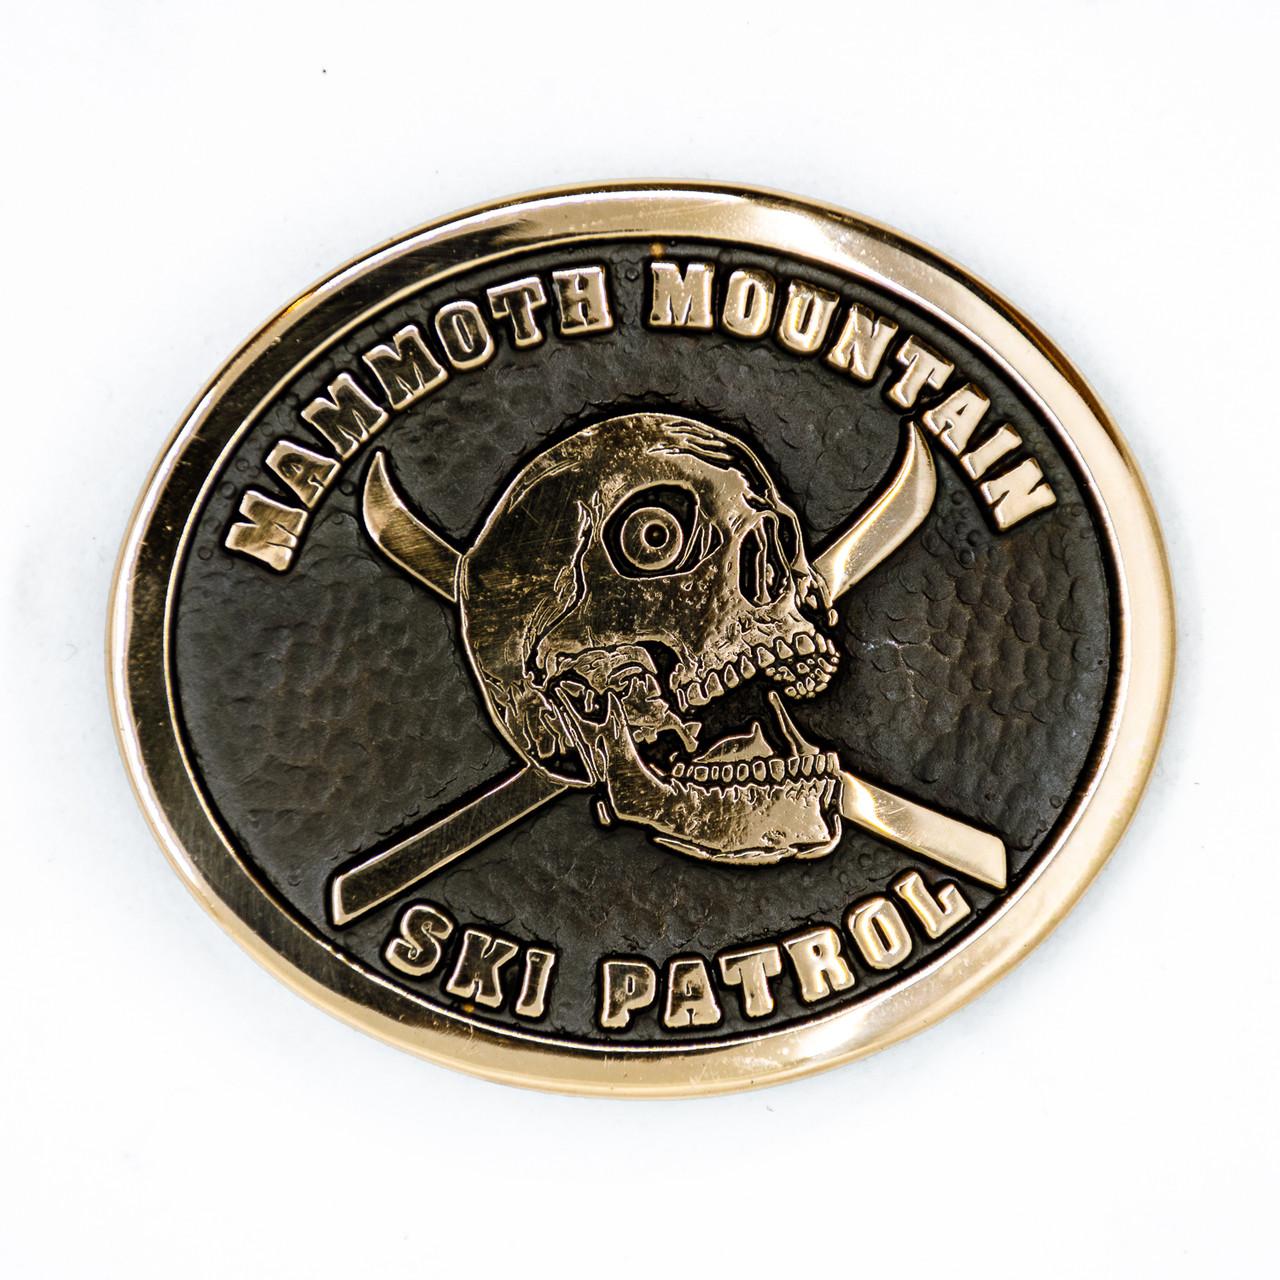 Mammoth Mountain Ski Patrol Buckle (RESTRICTED)